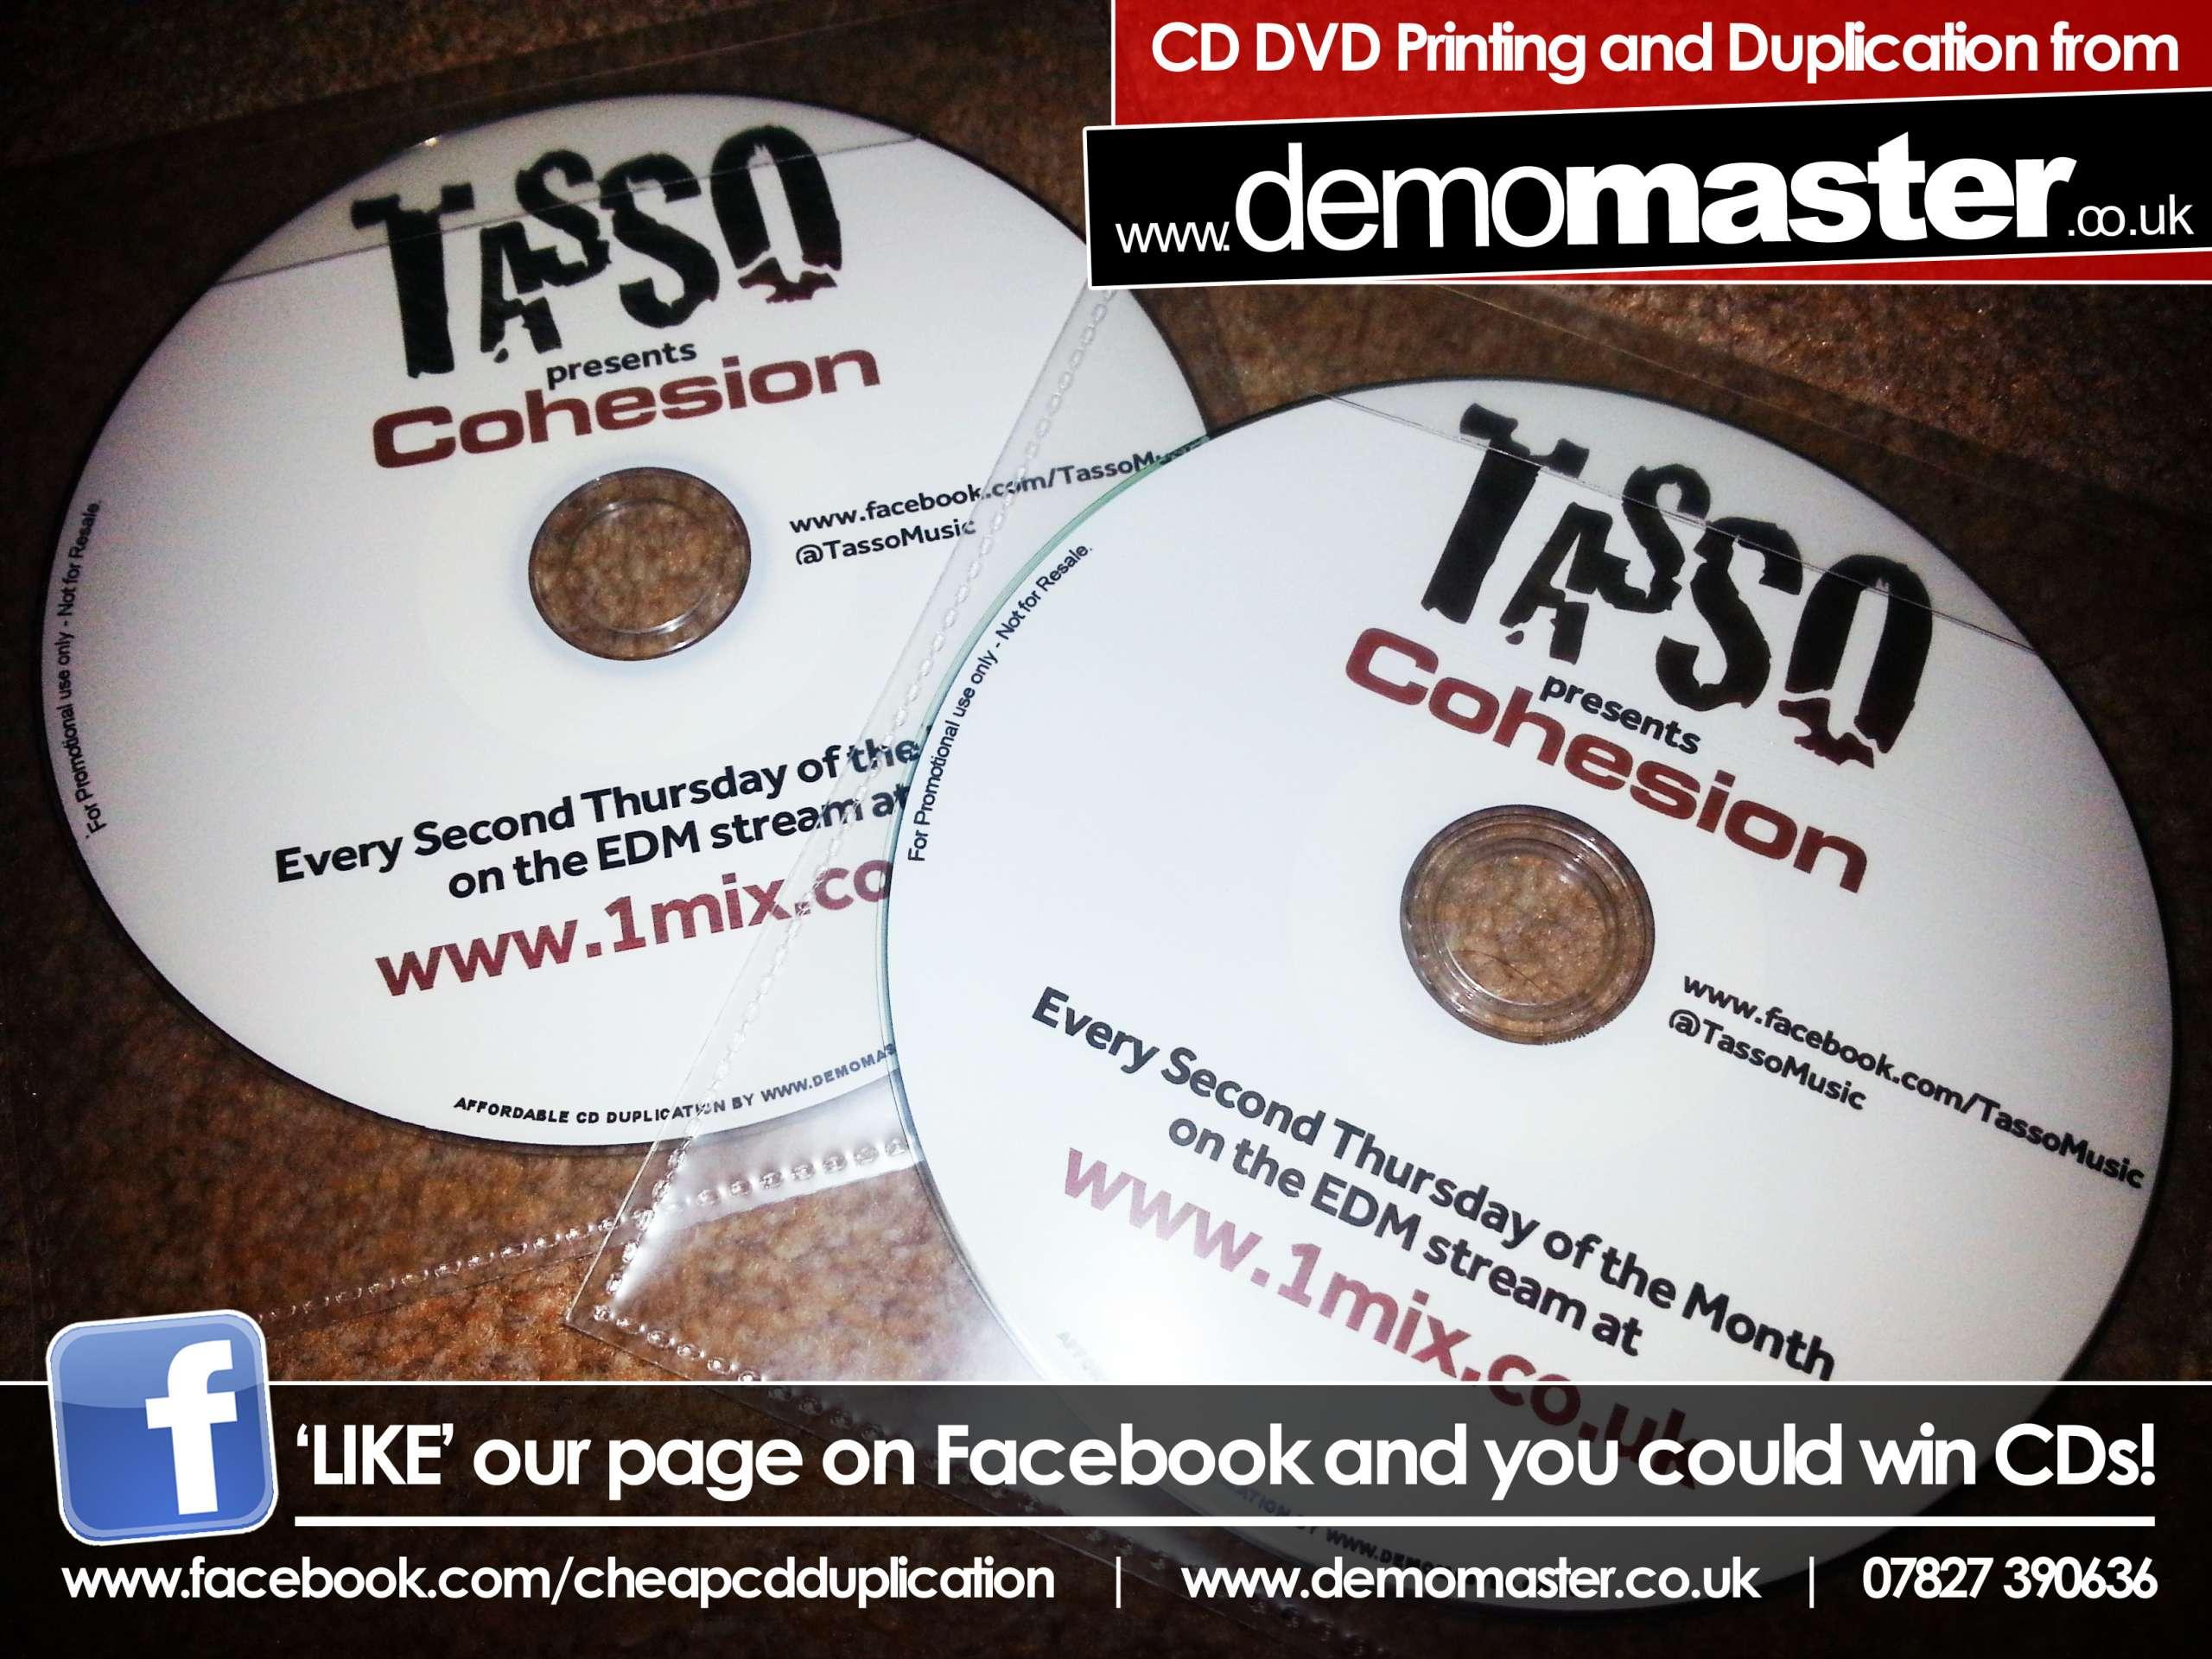 Tasso presents Cohesion